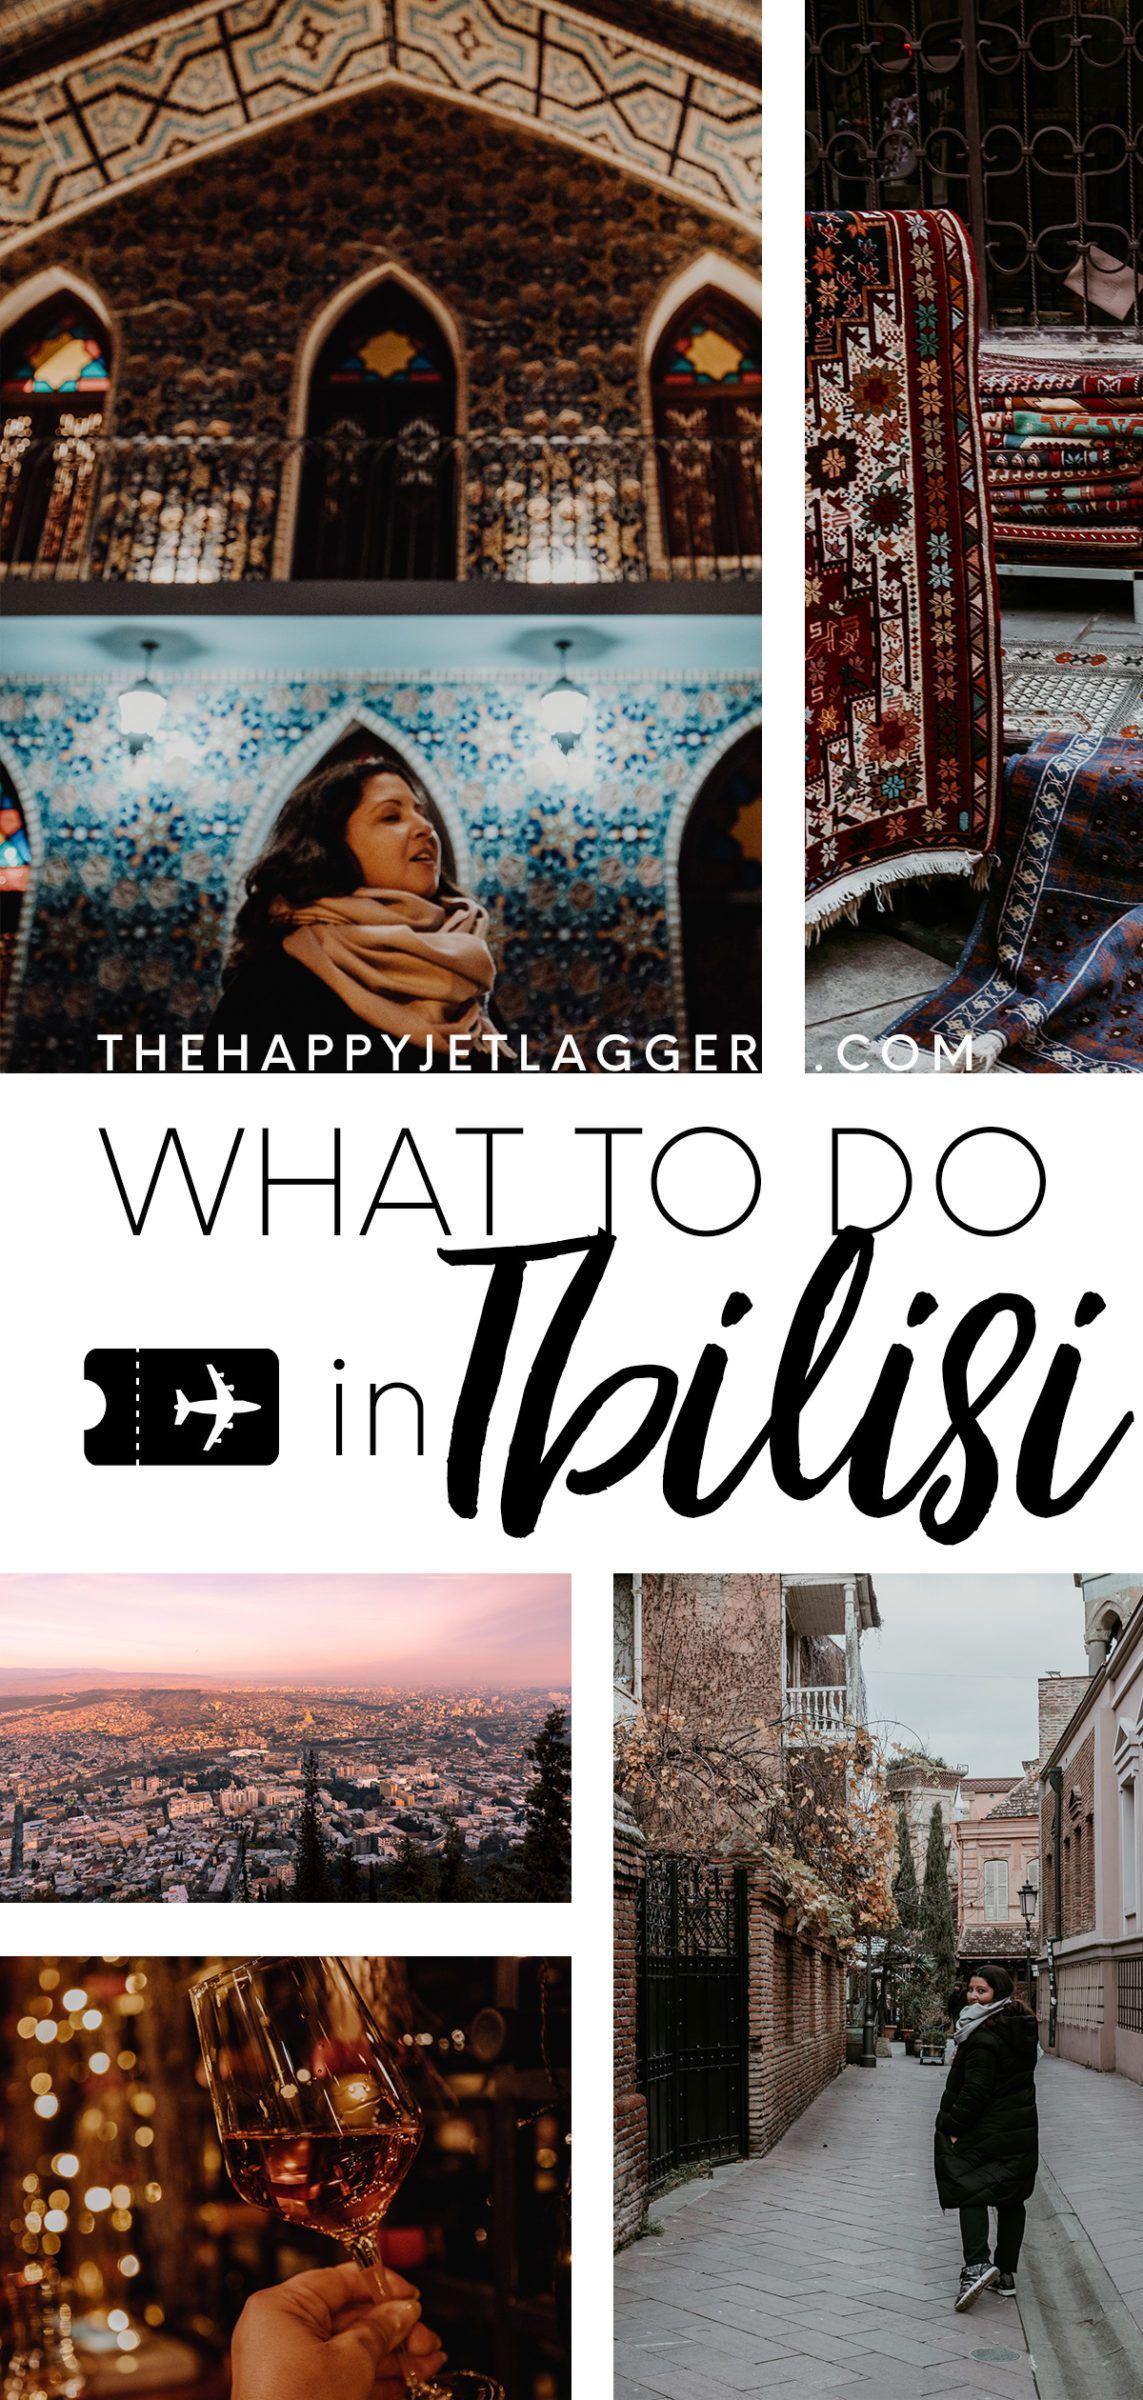 Tiflis Sehenswürdigkeiten Top10 (+ Insider Tipps!) | Reiseblog The Happy Jetlagger